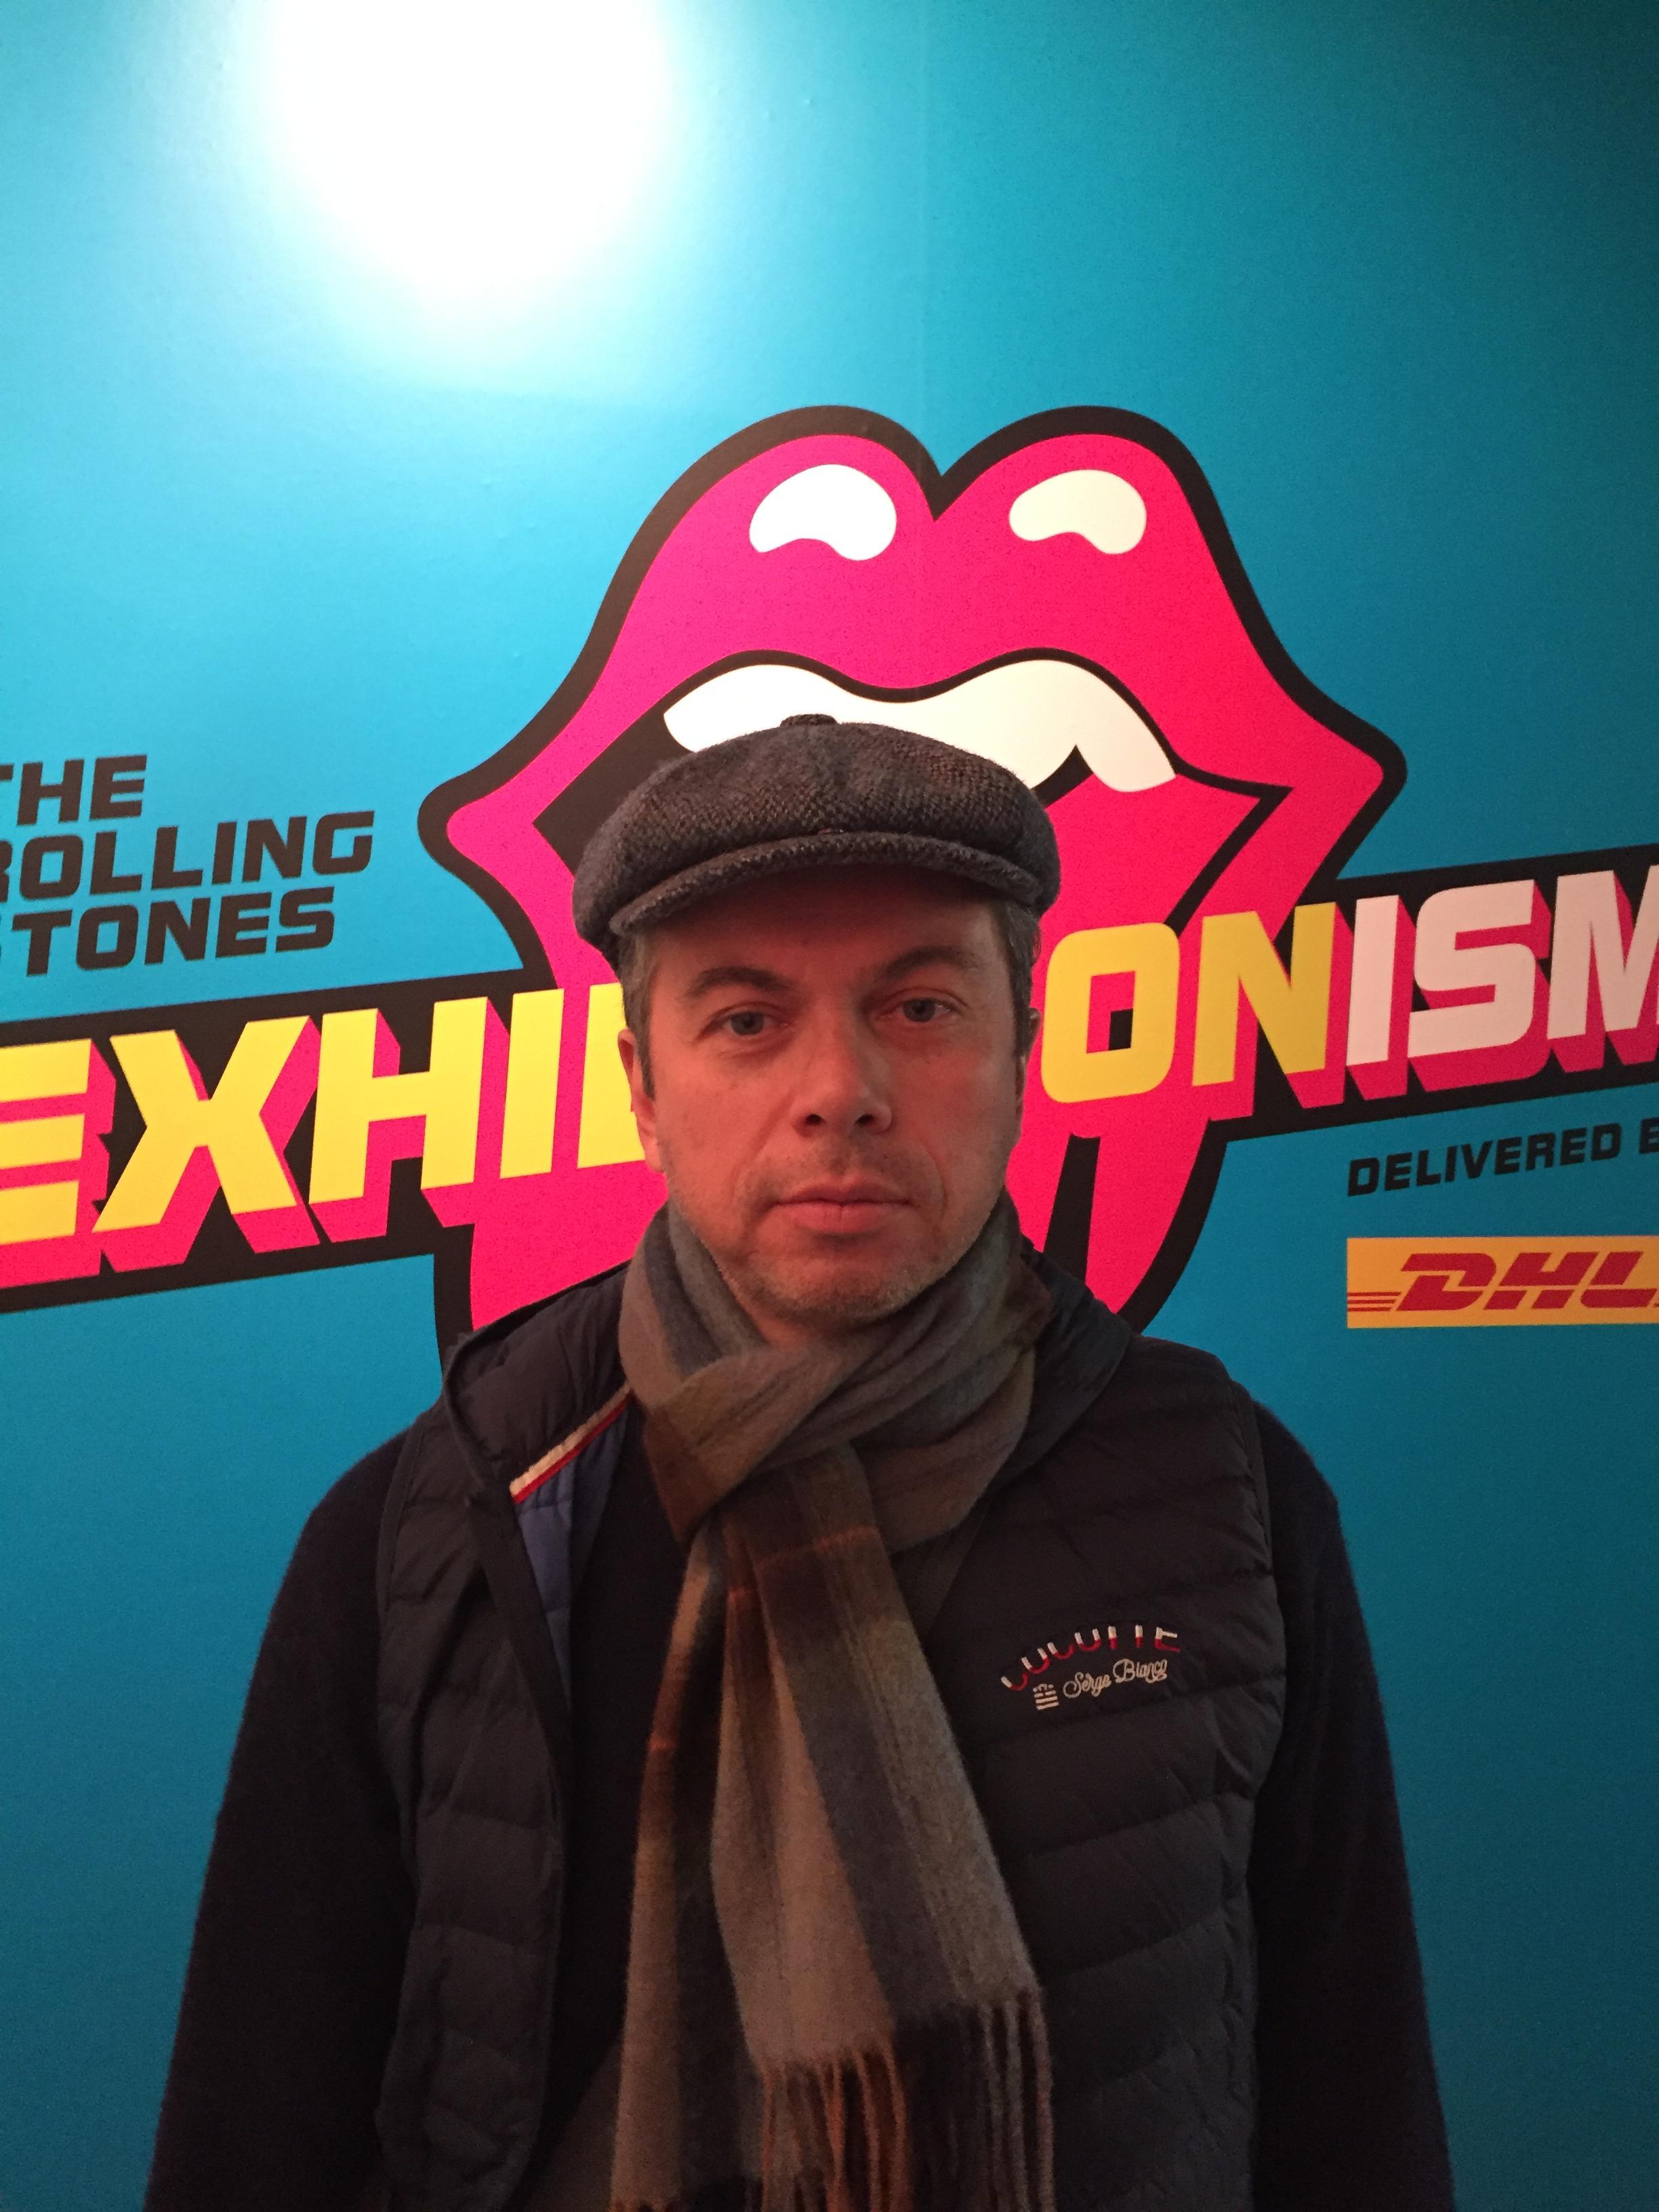 The Rolling Stones Exhibitionism